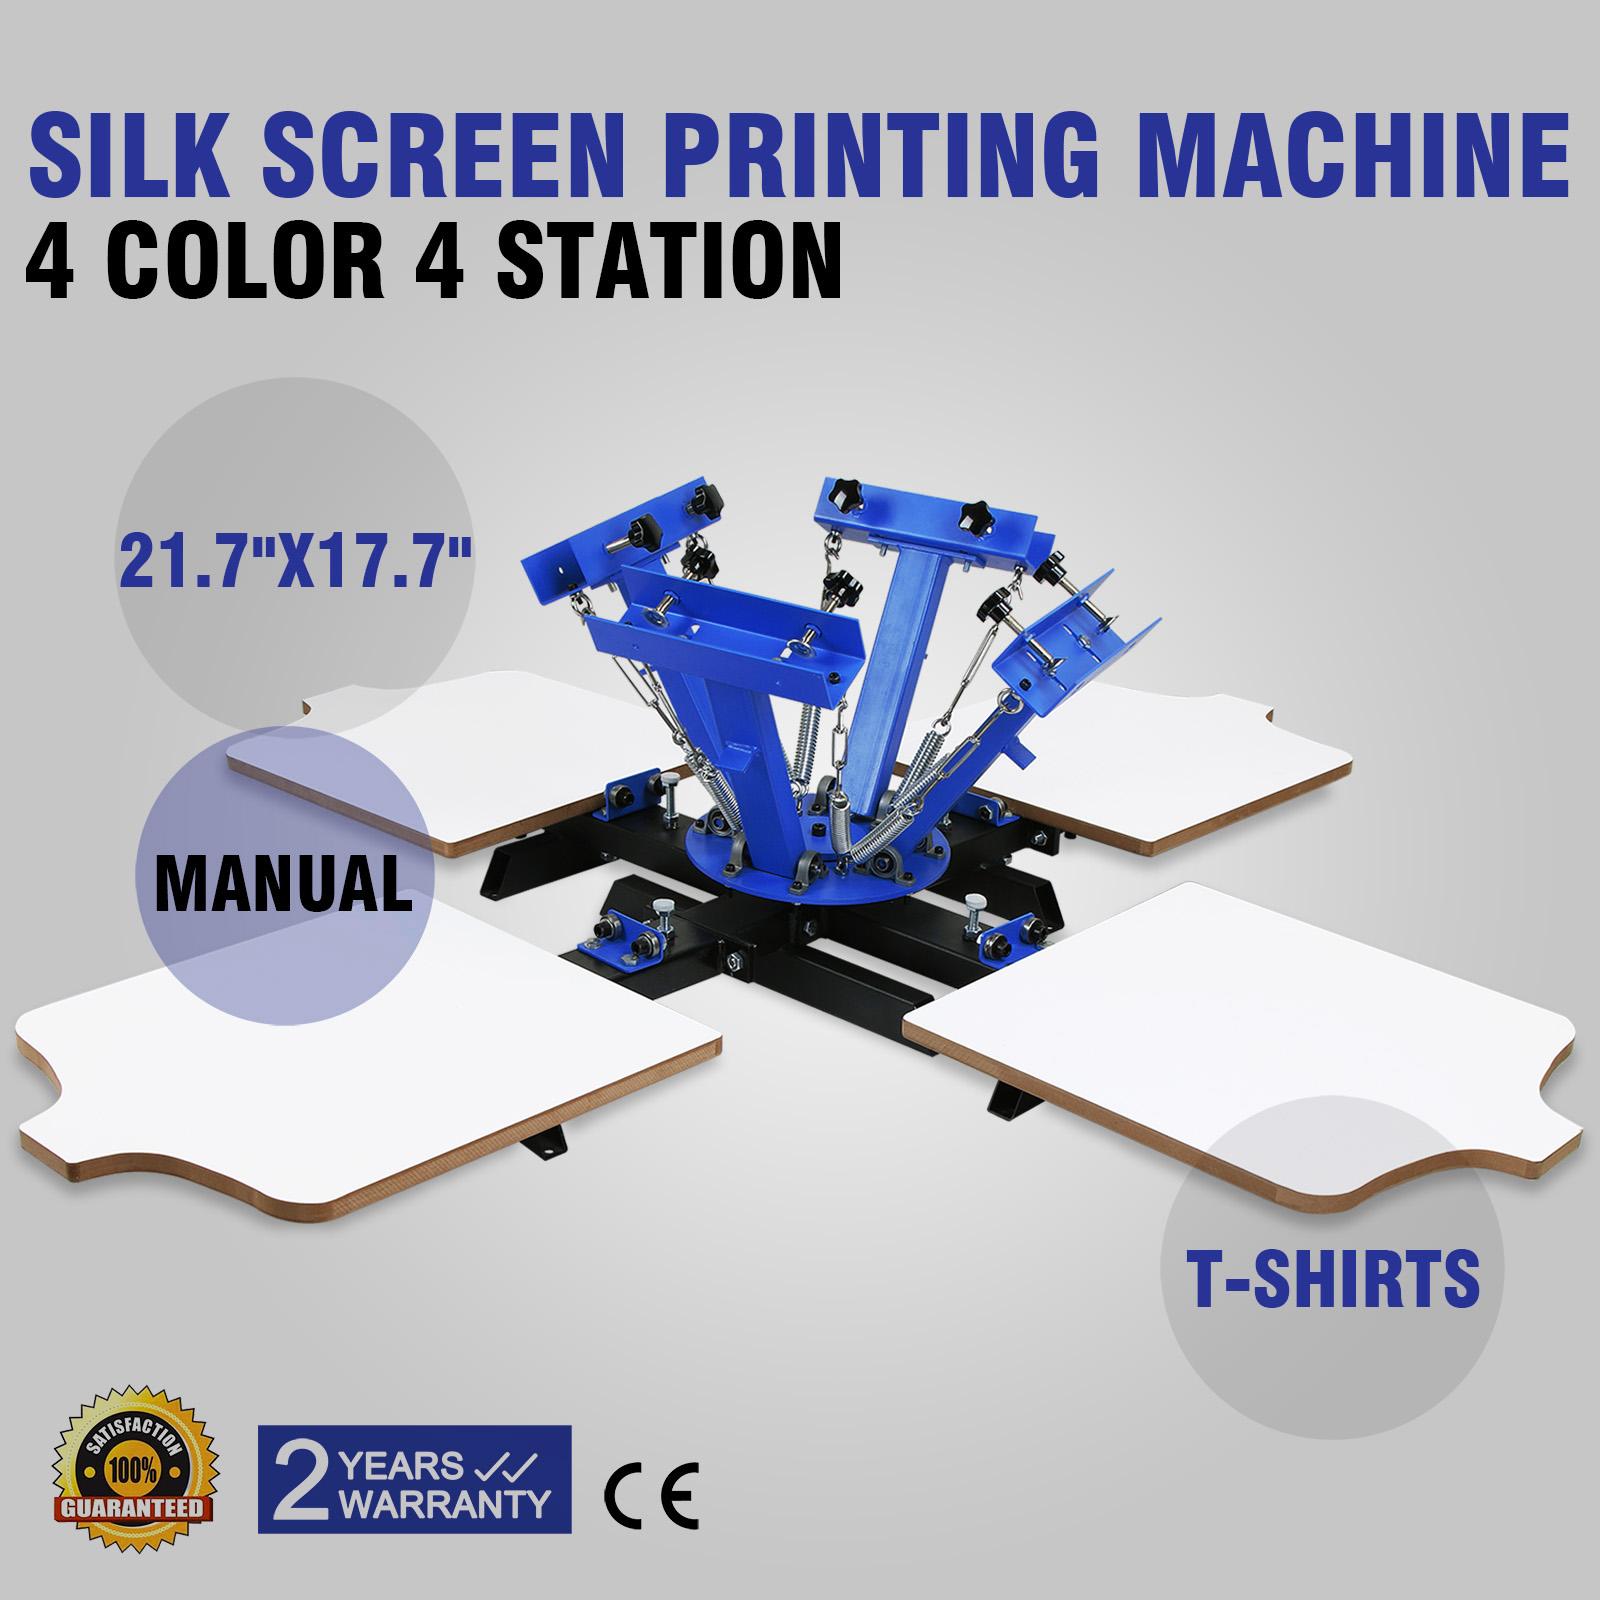 4 Color 4 Station Silk Screen Printing Machine Printing